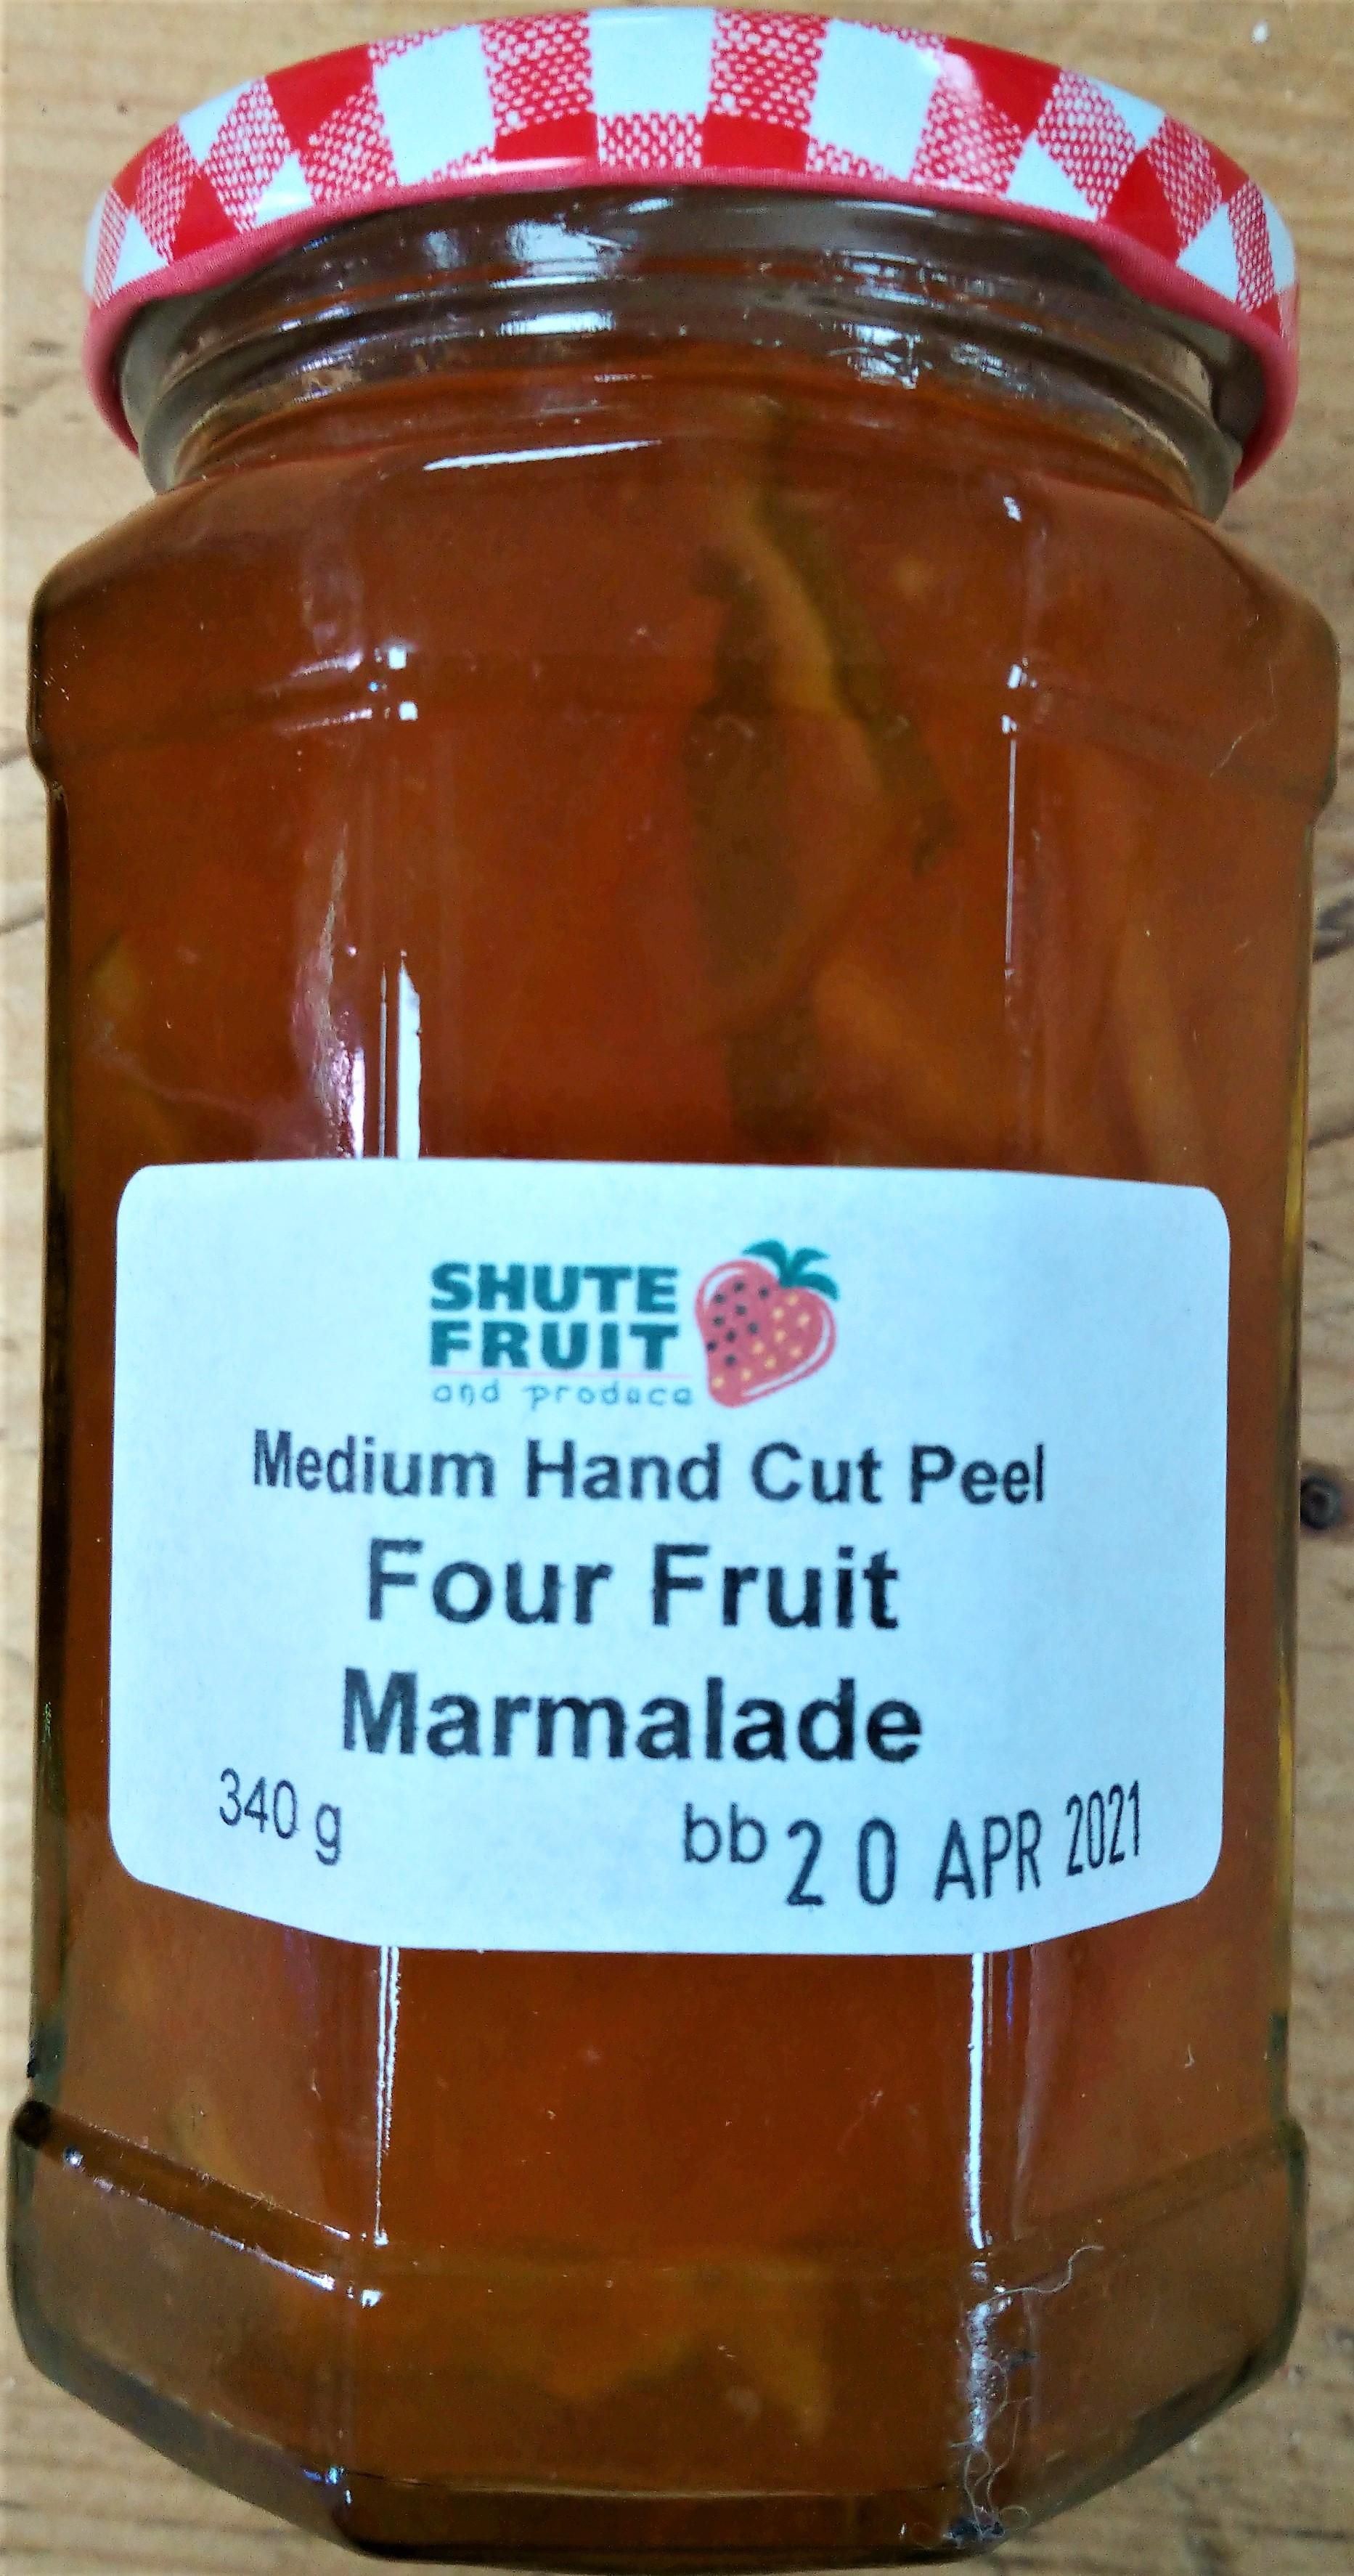 Shute Fruit Marmalade